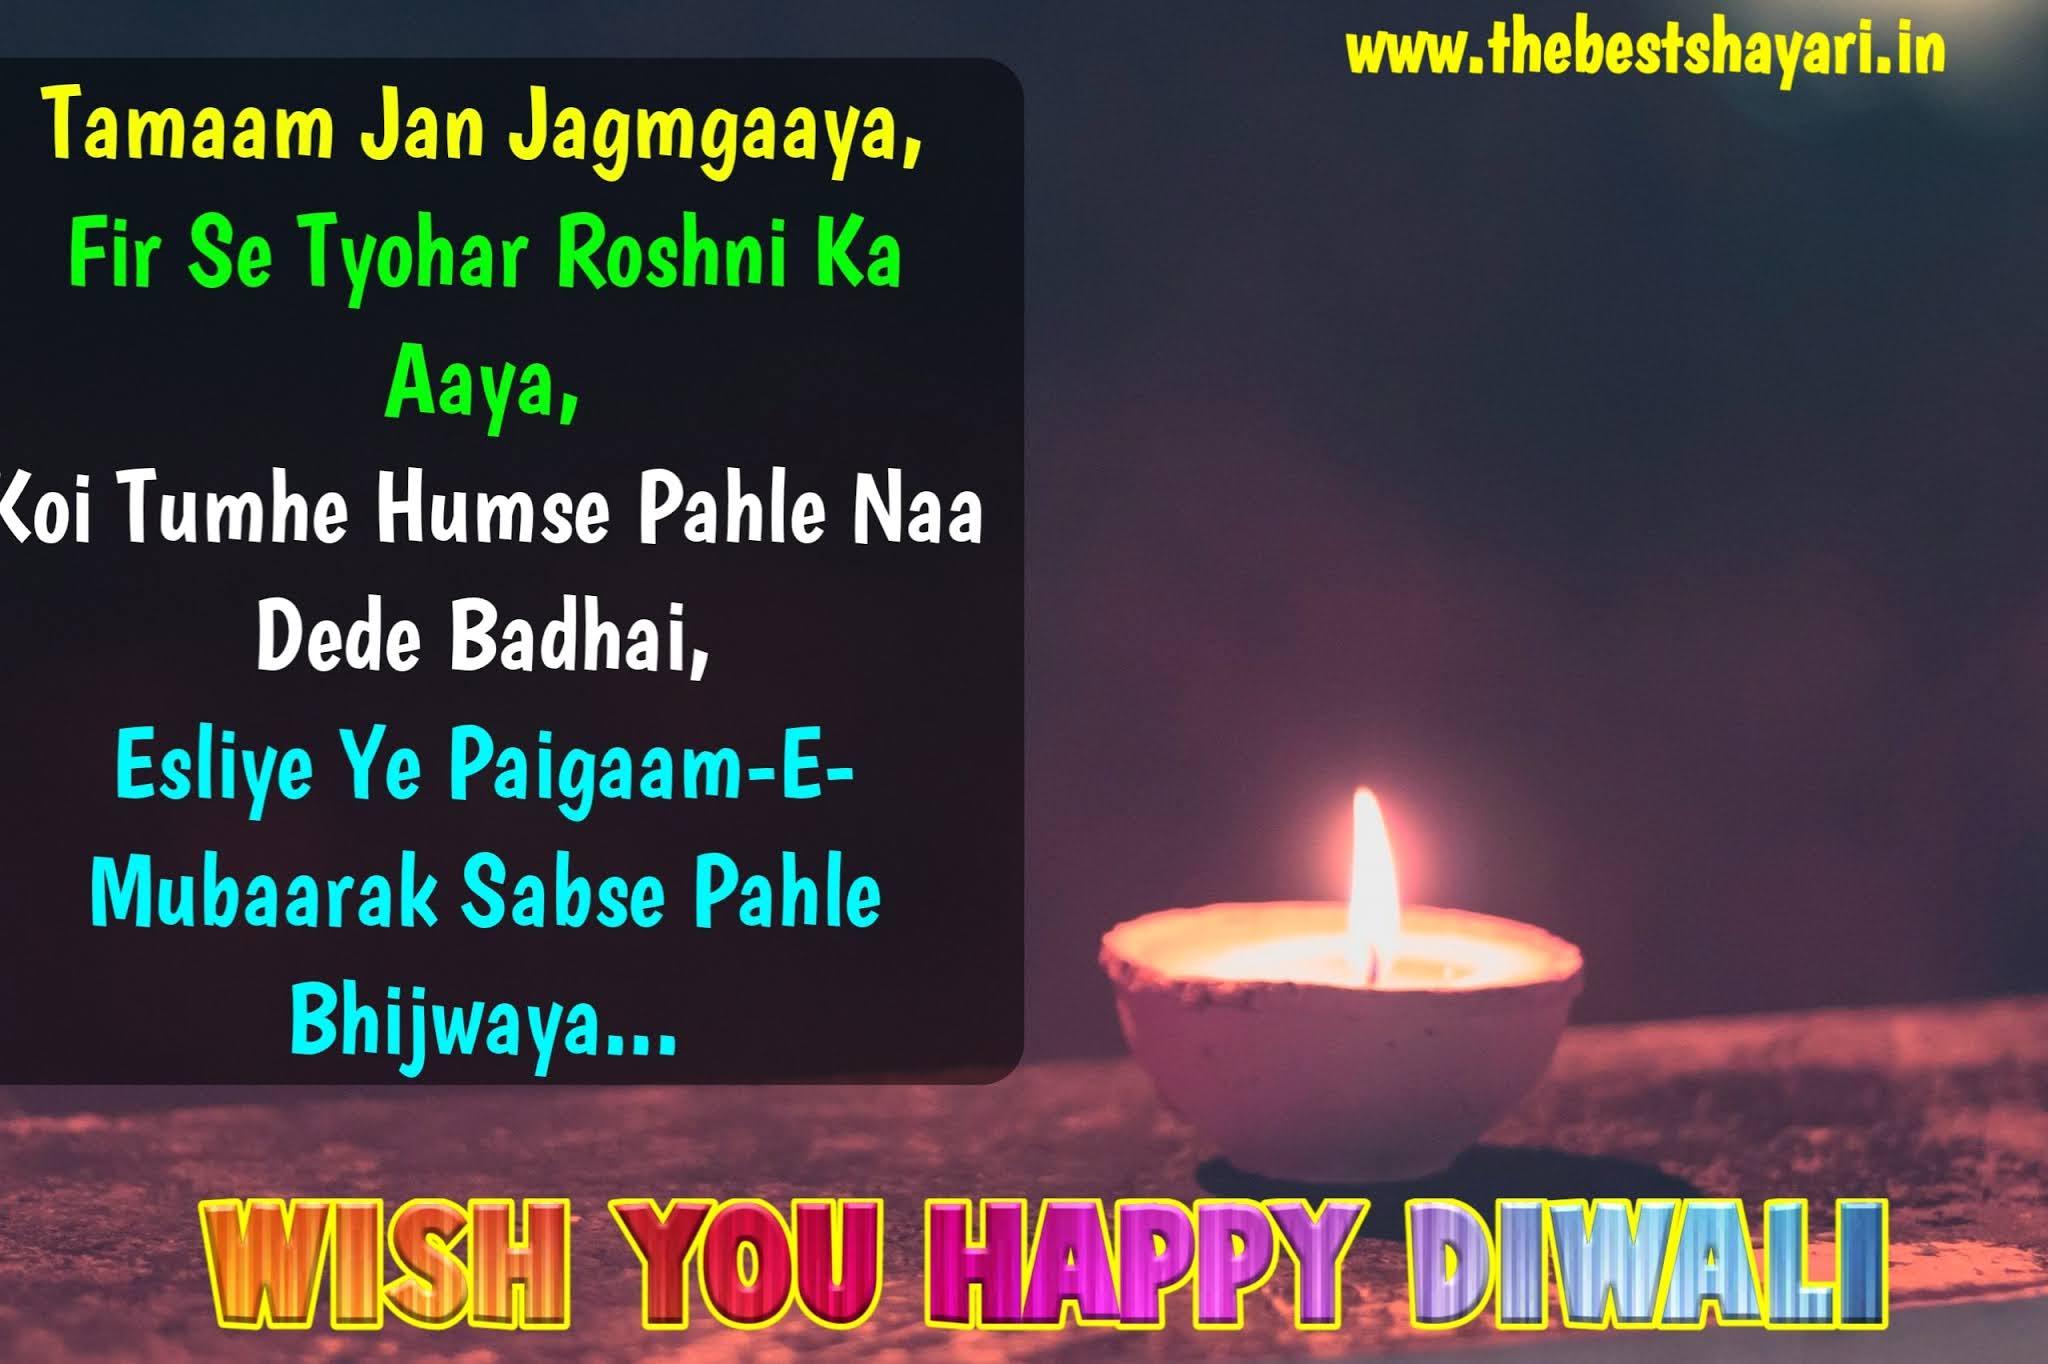 diwali wishes photos